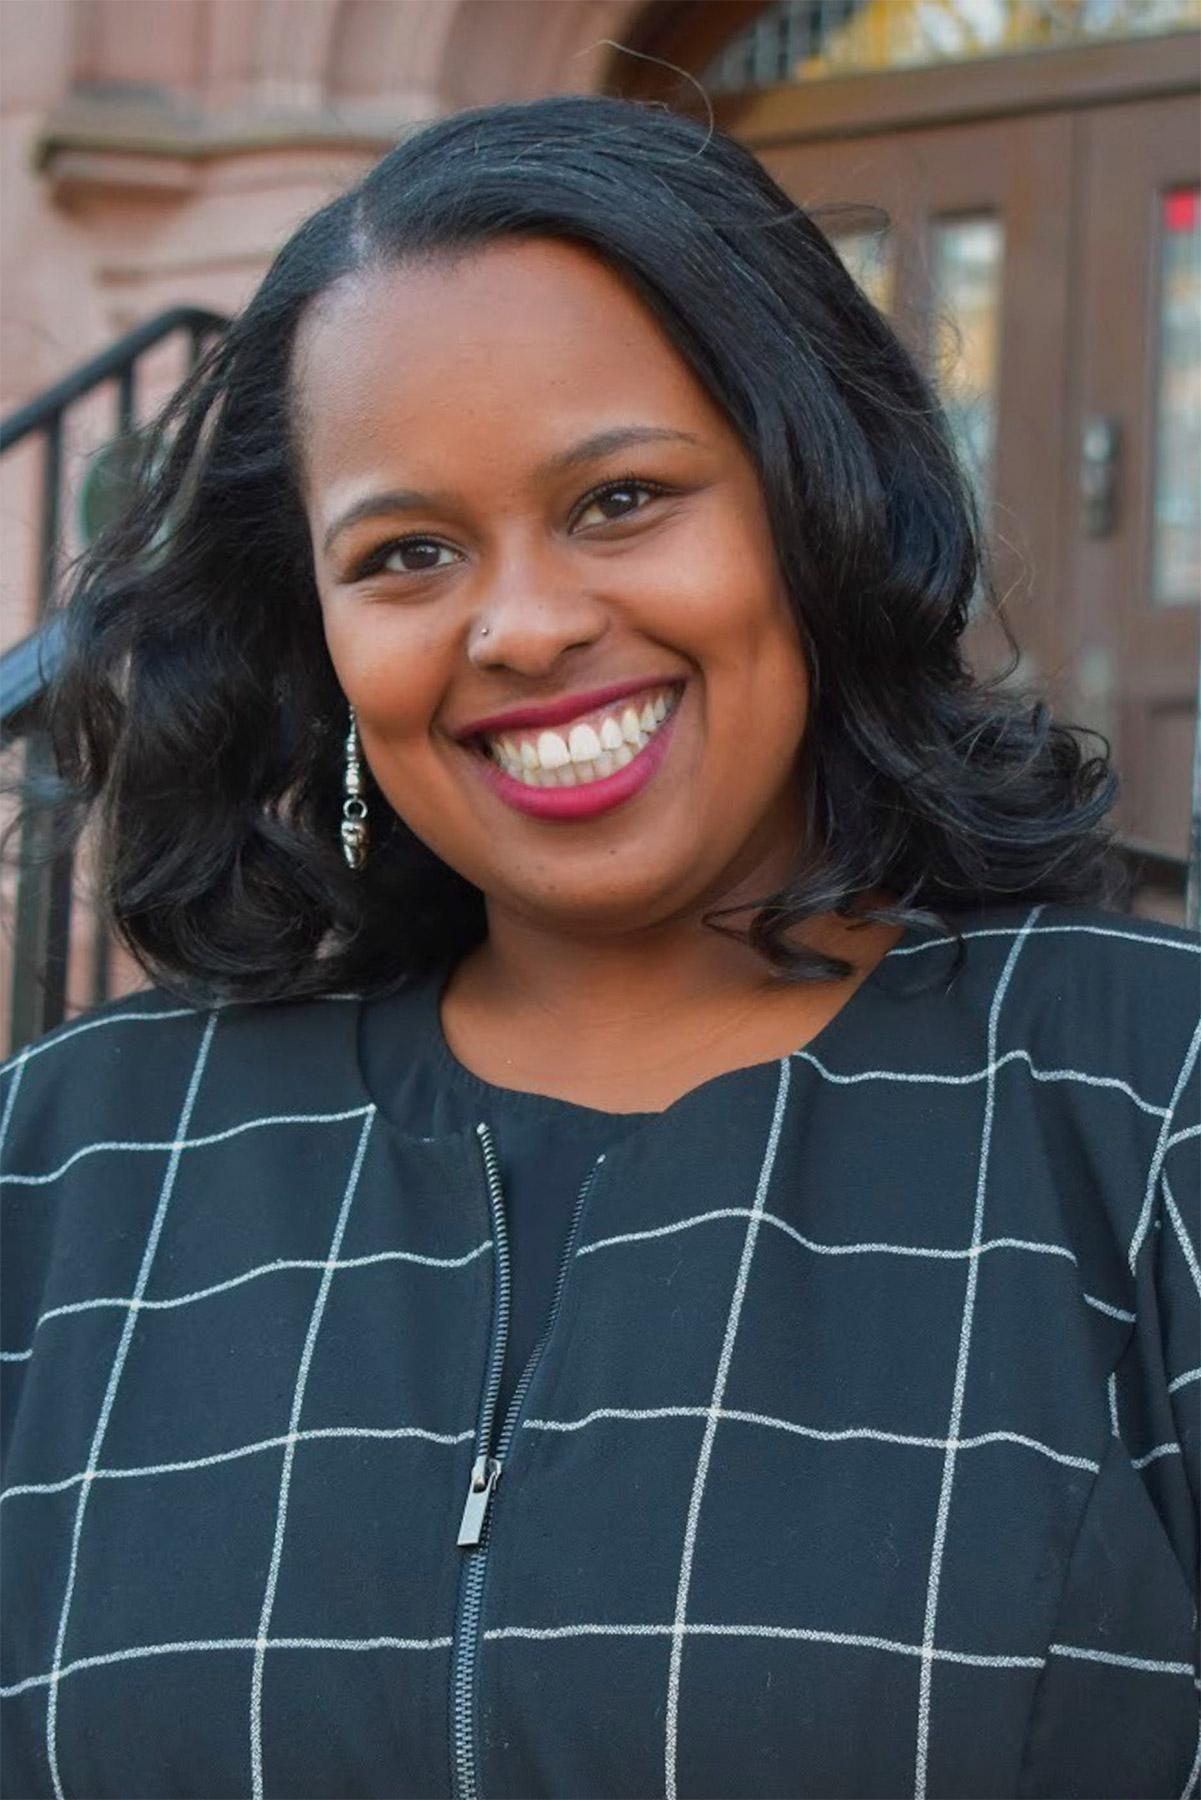 Portrait of Taneisha N. Means